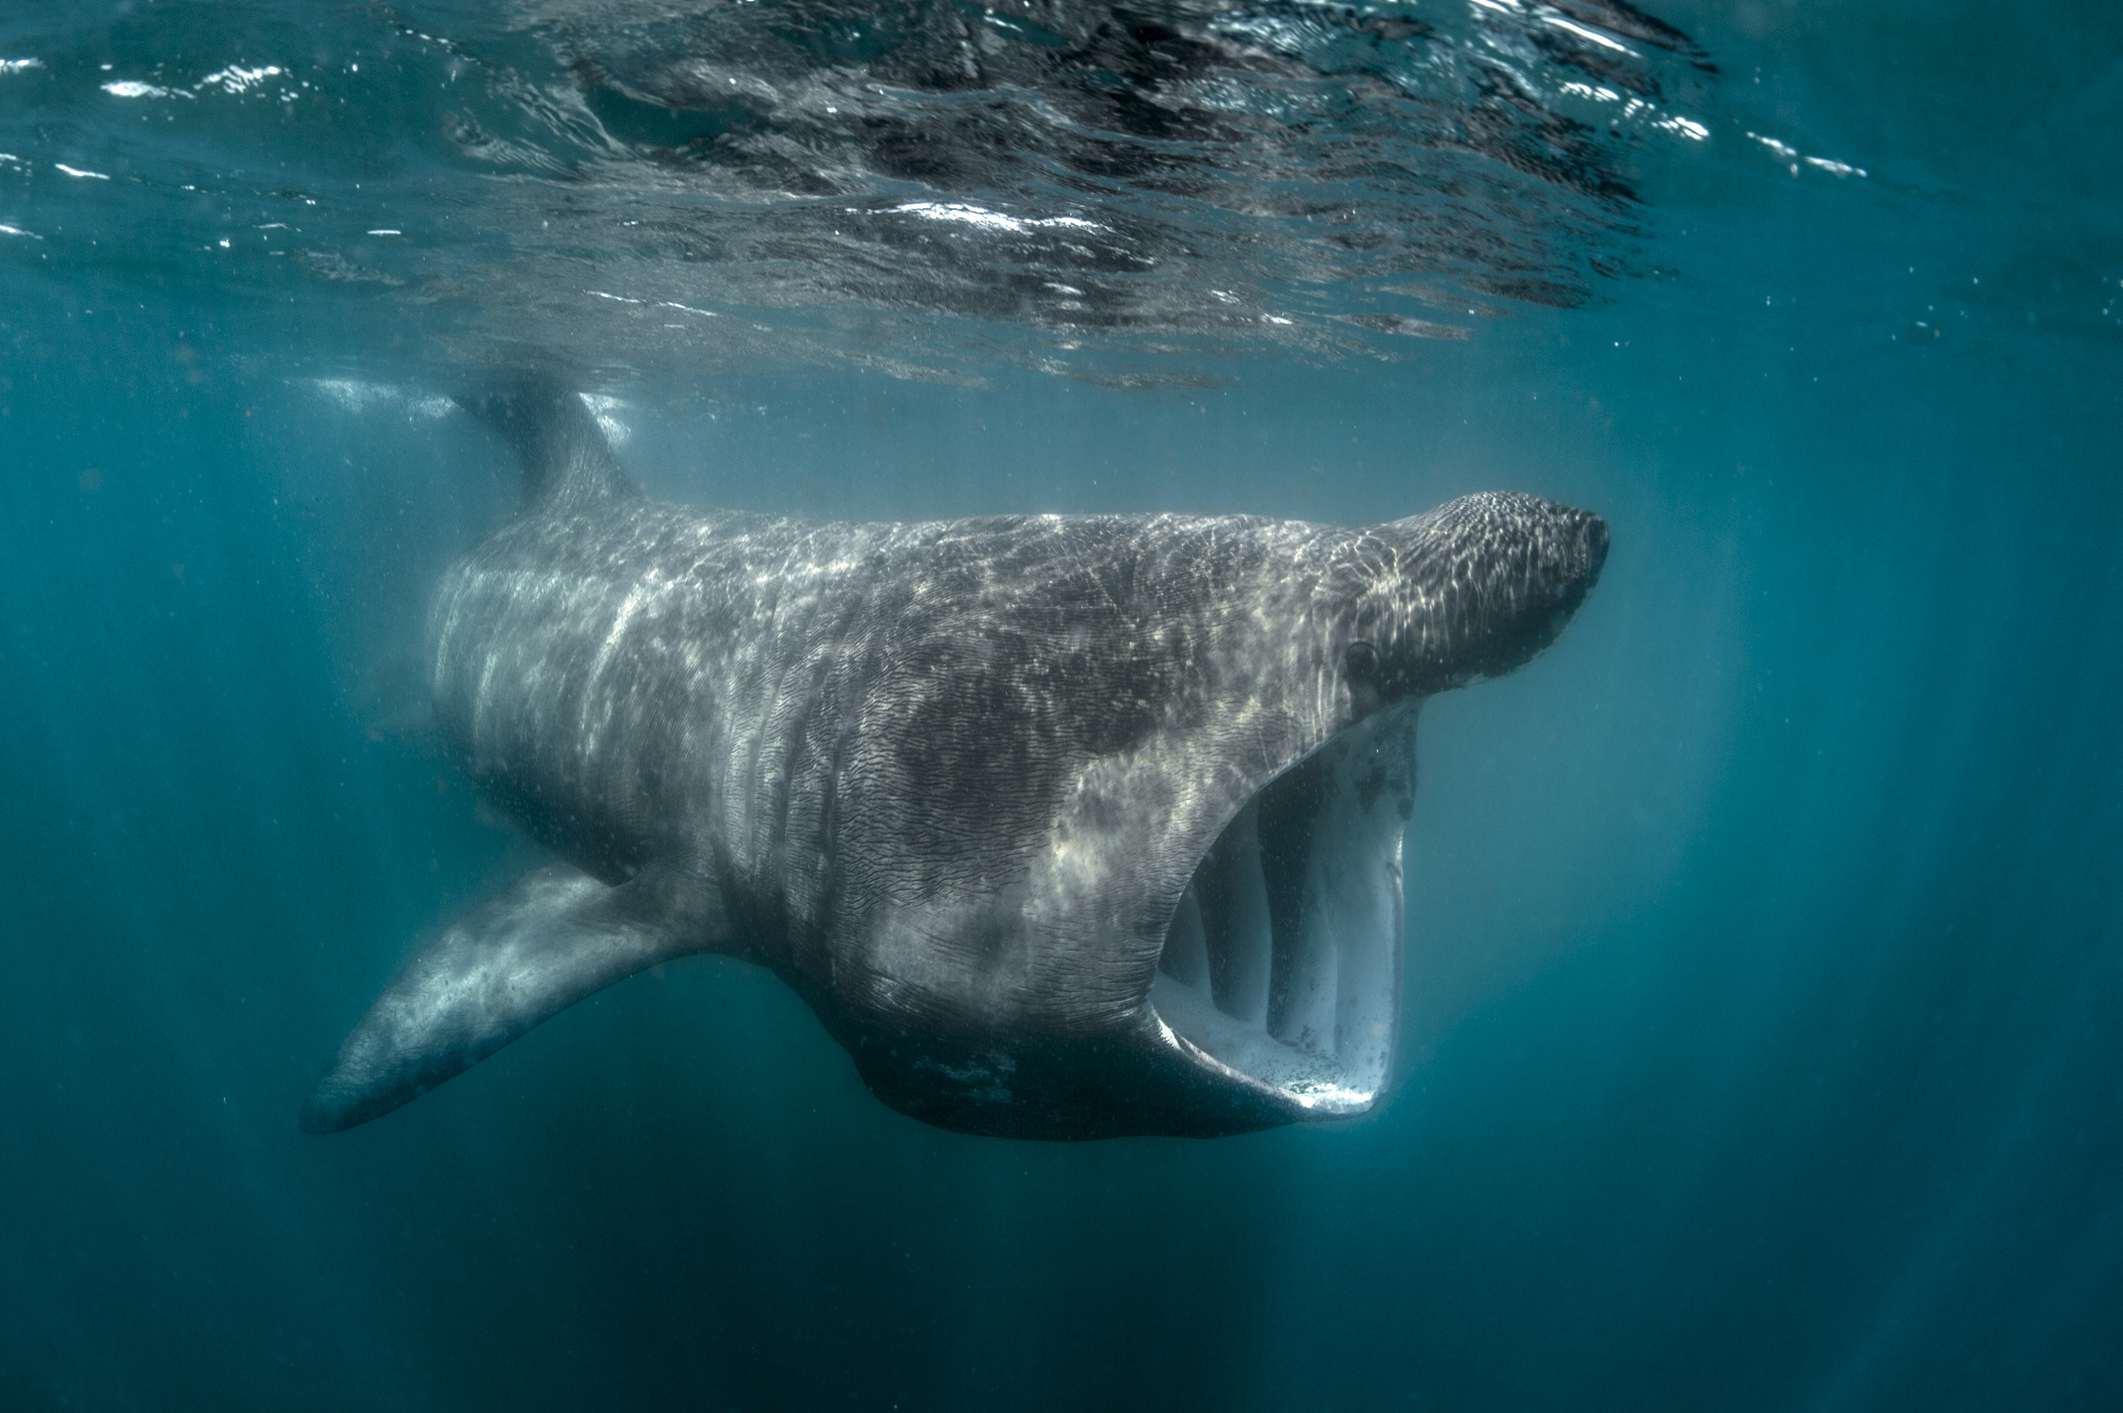 Worlds biggest fish